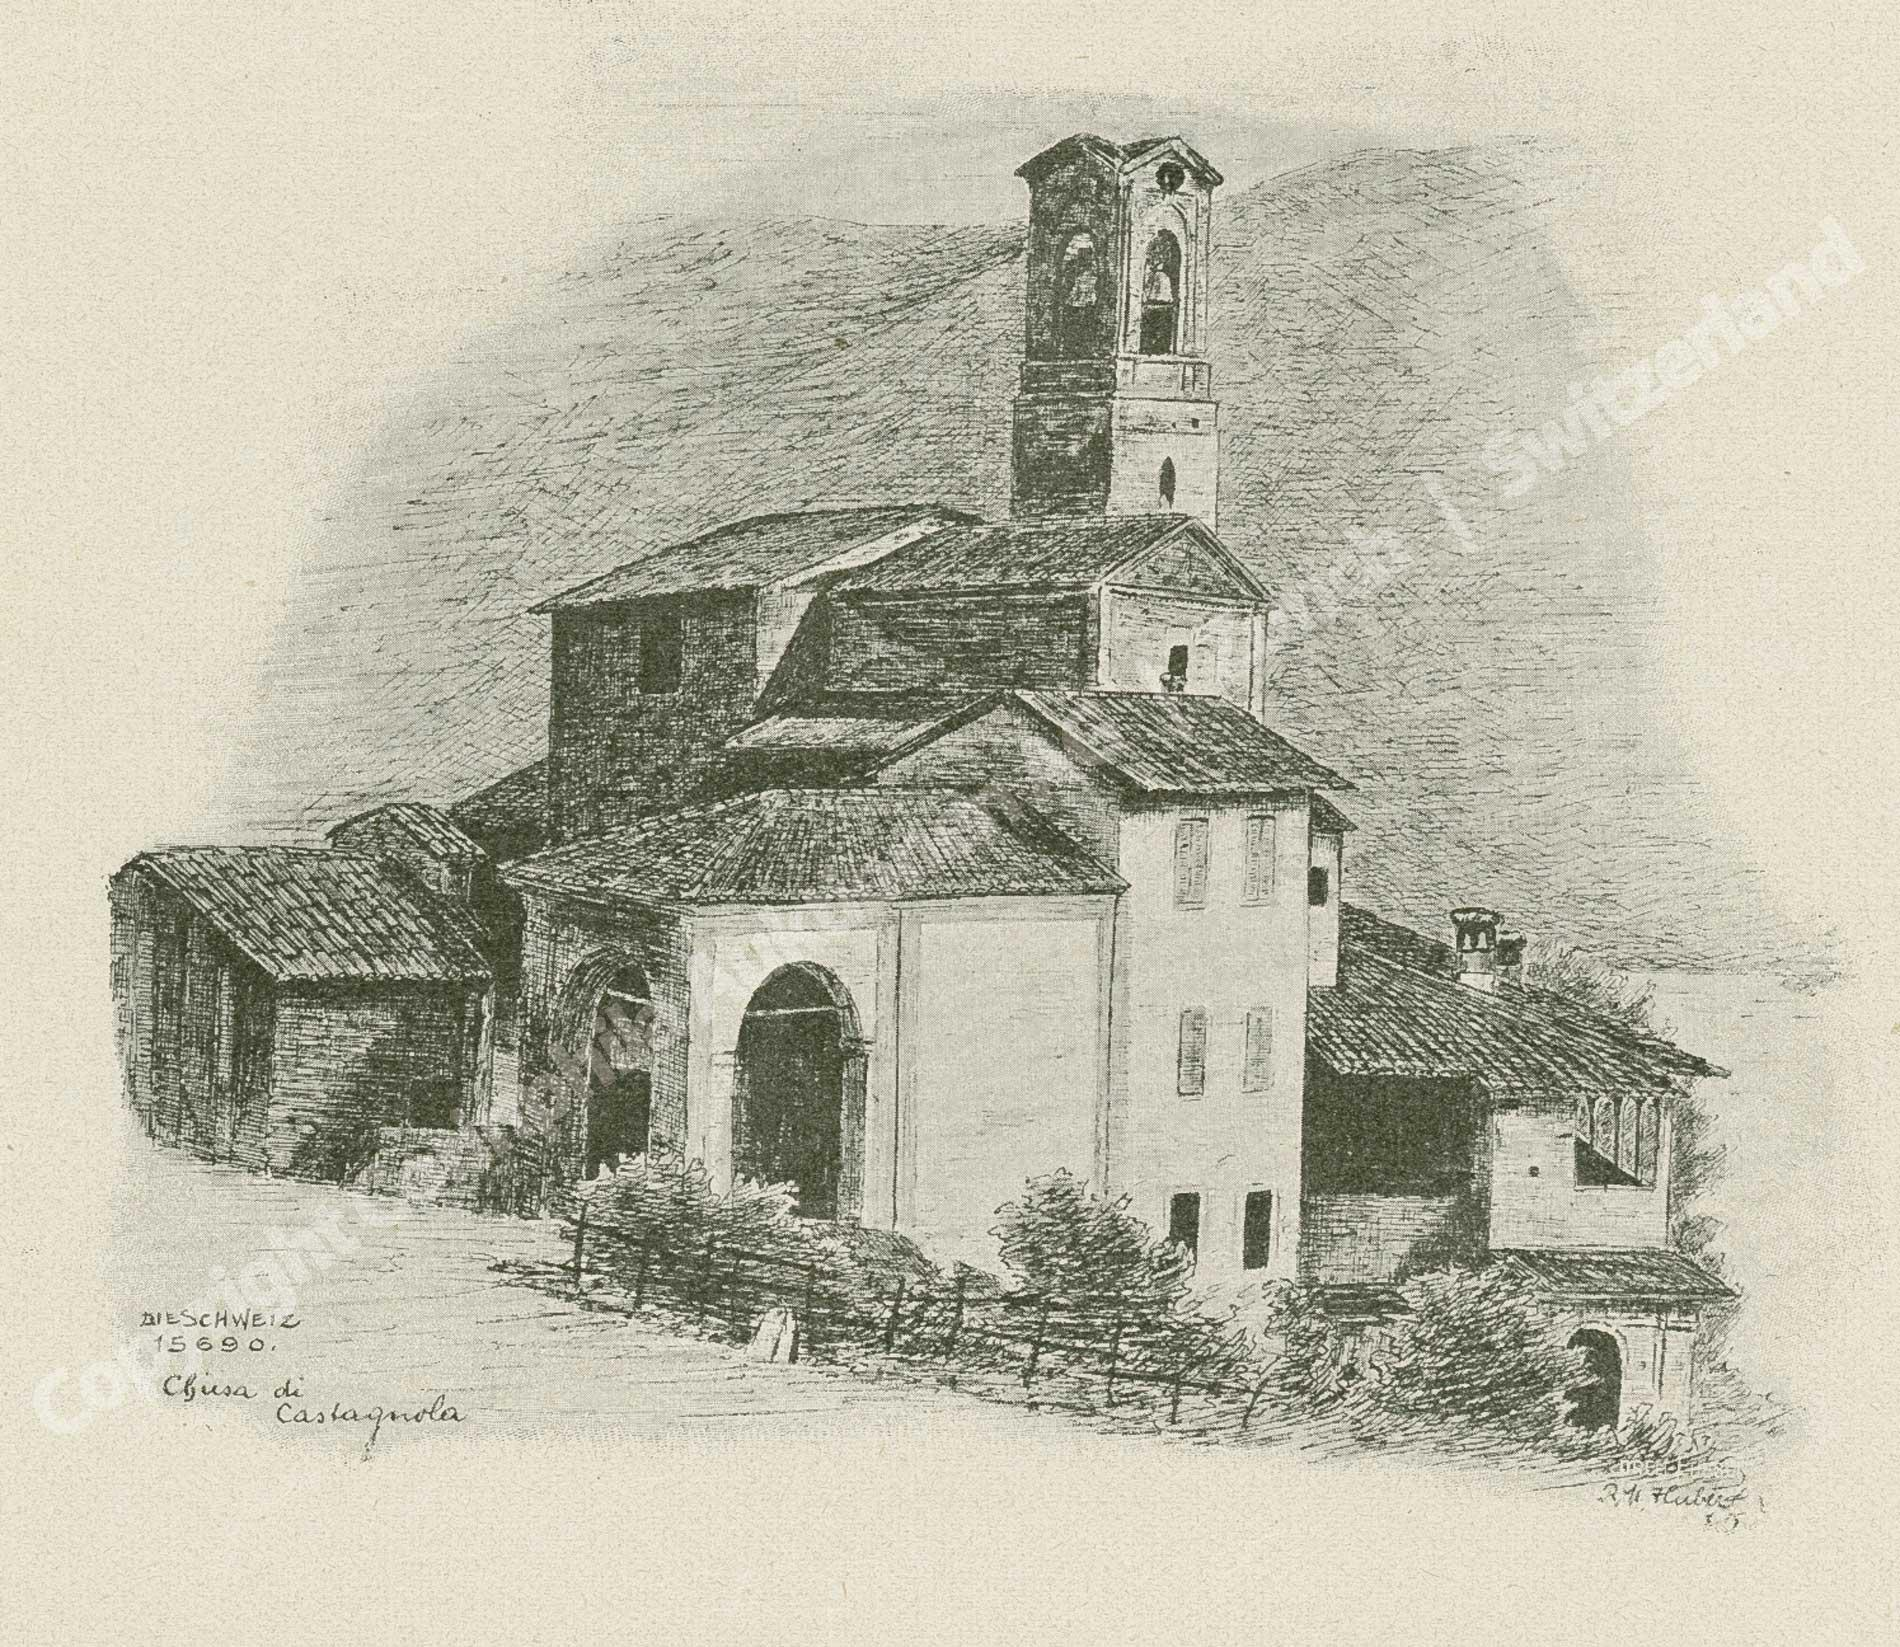 Castagnola